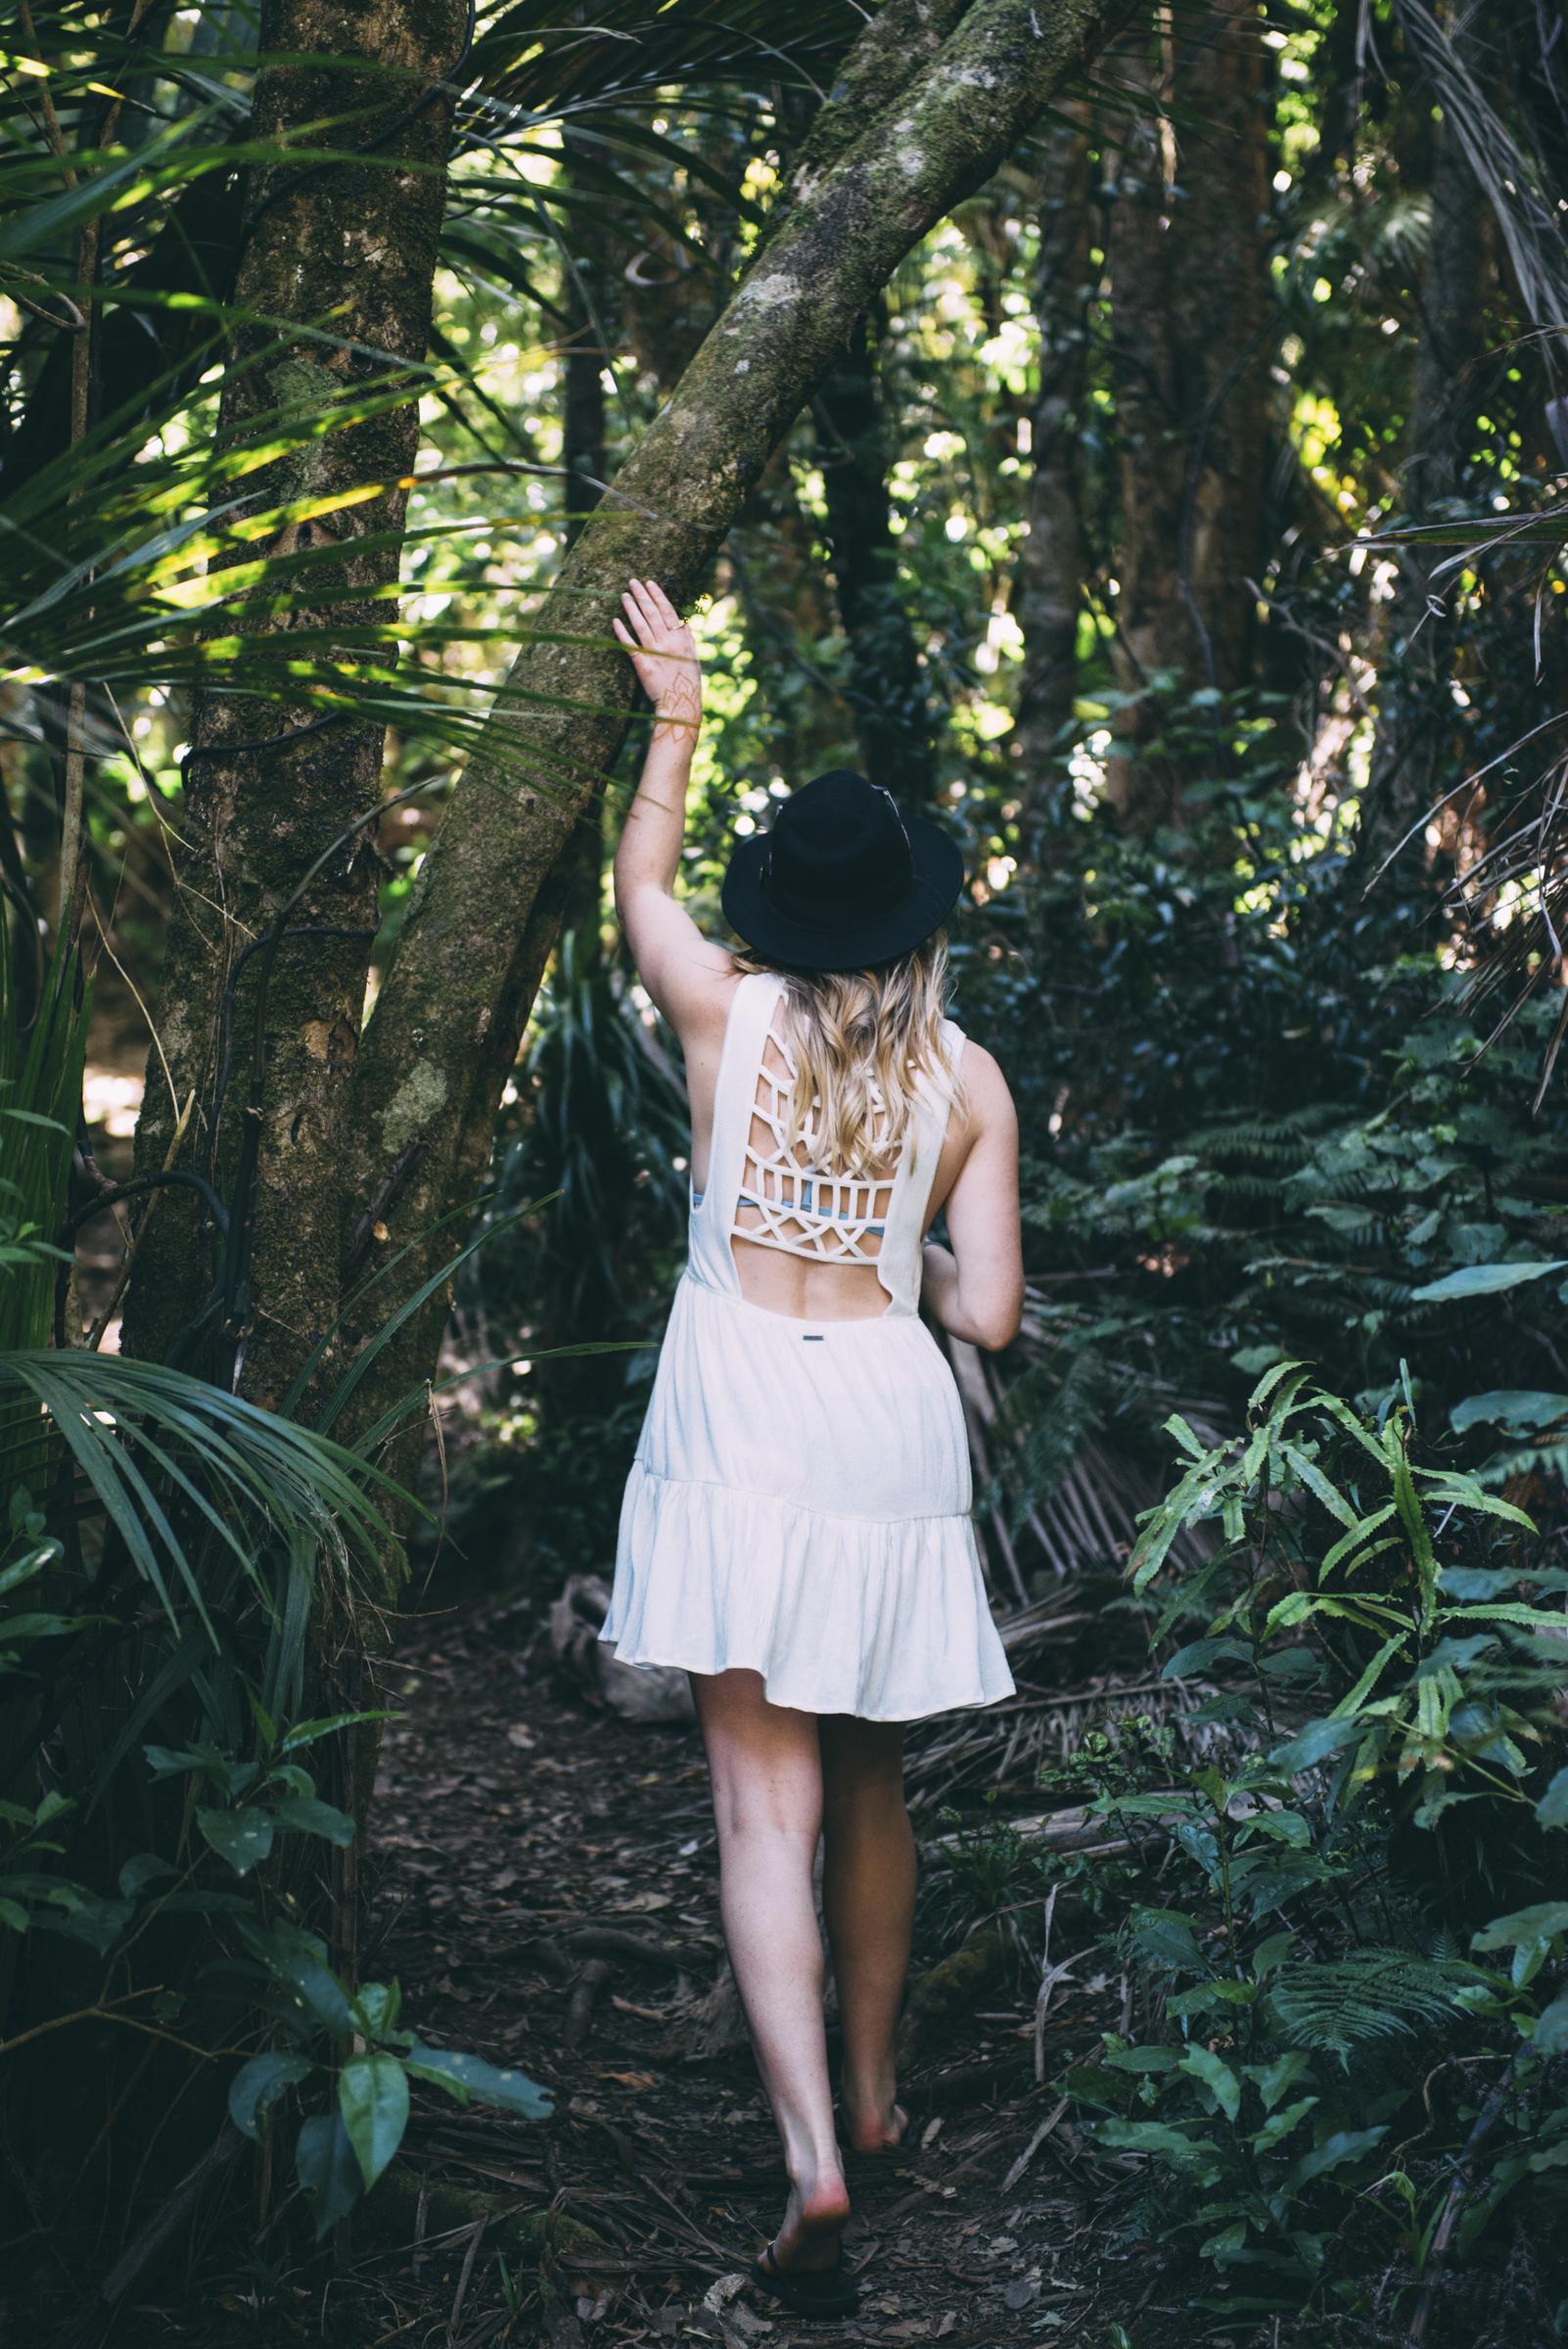 New Zealand Road Trip Lola Photography WEB_002.jpg